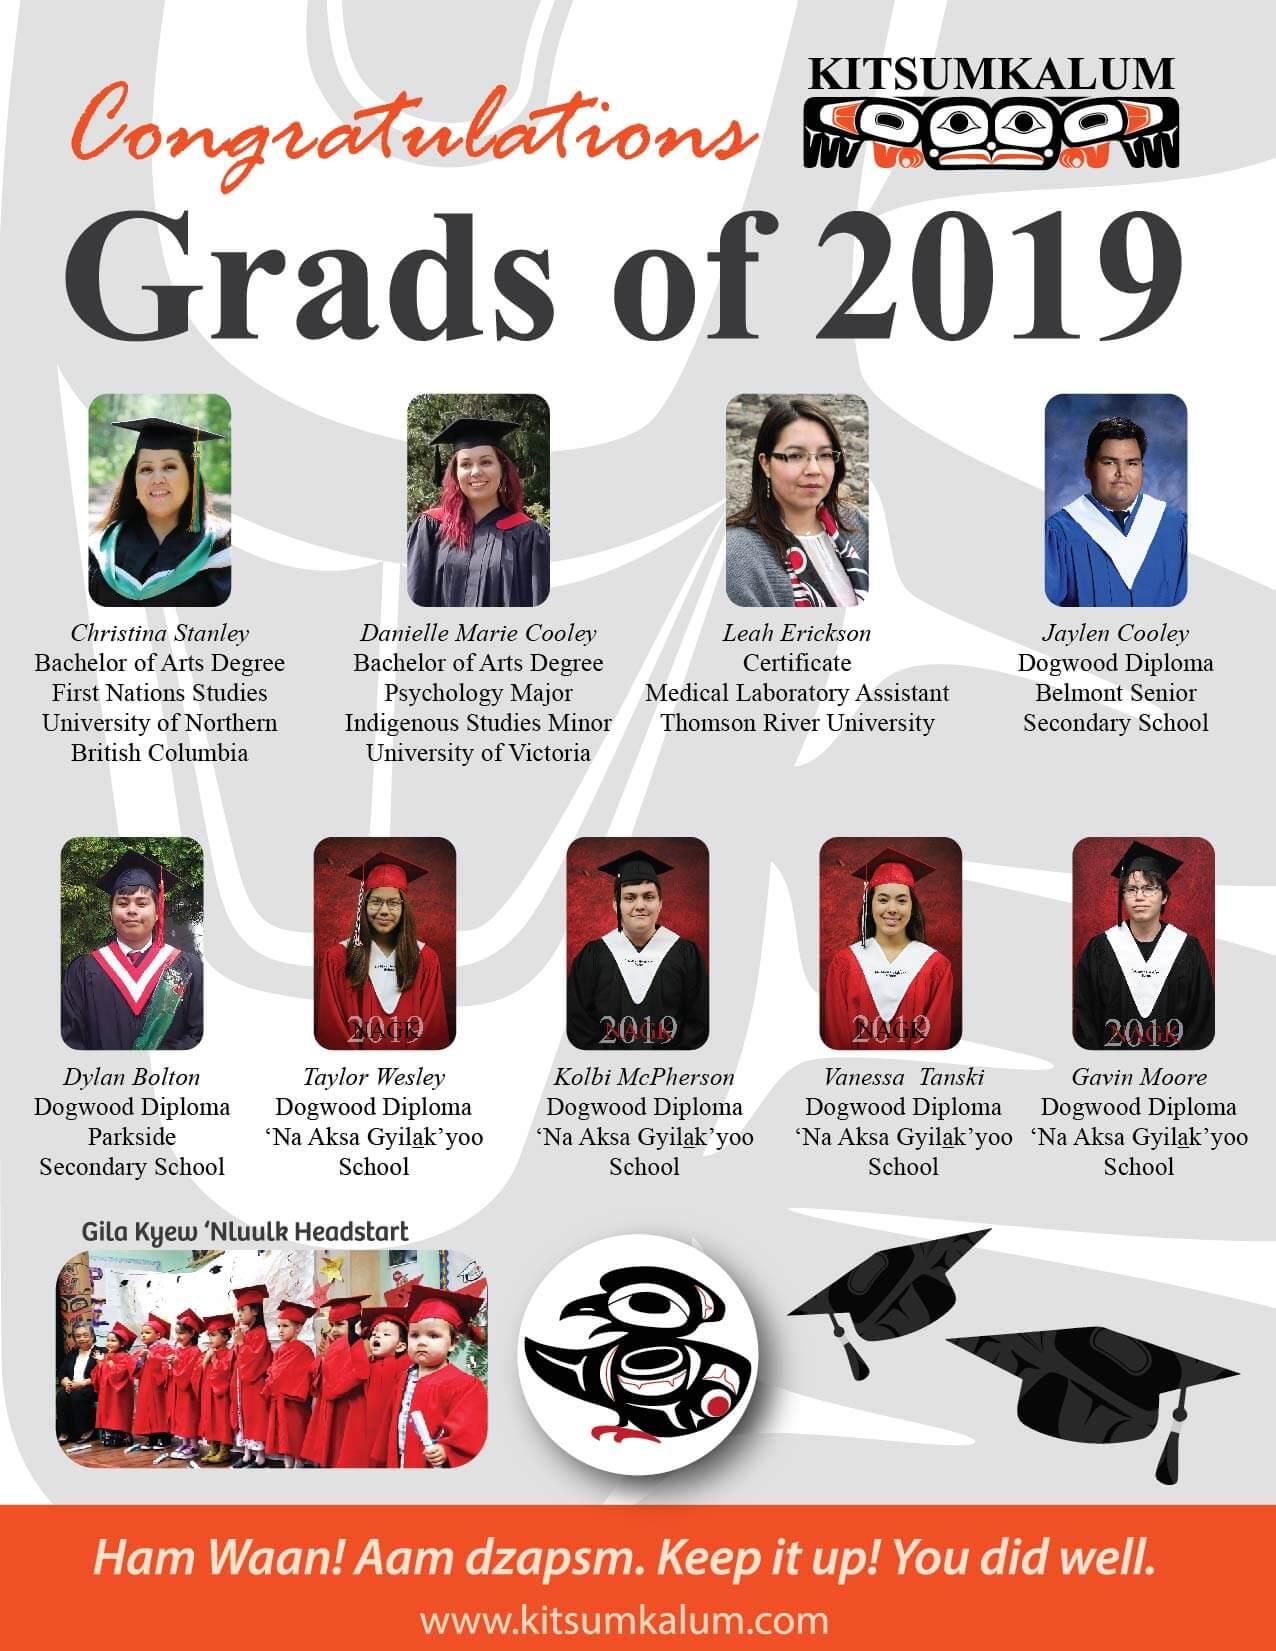 Congratulations Kitsumkalum Grads of 2019